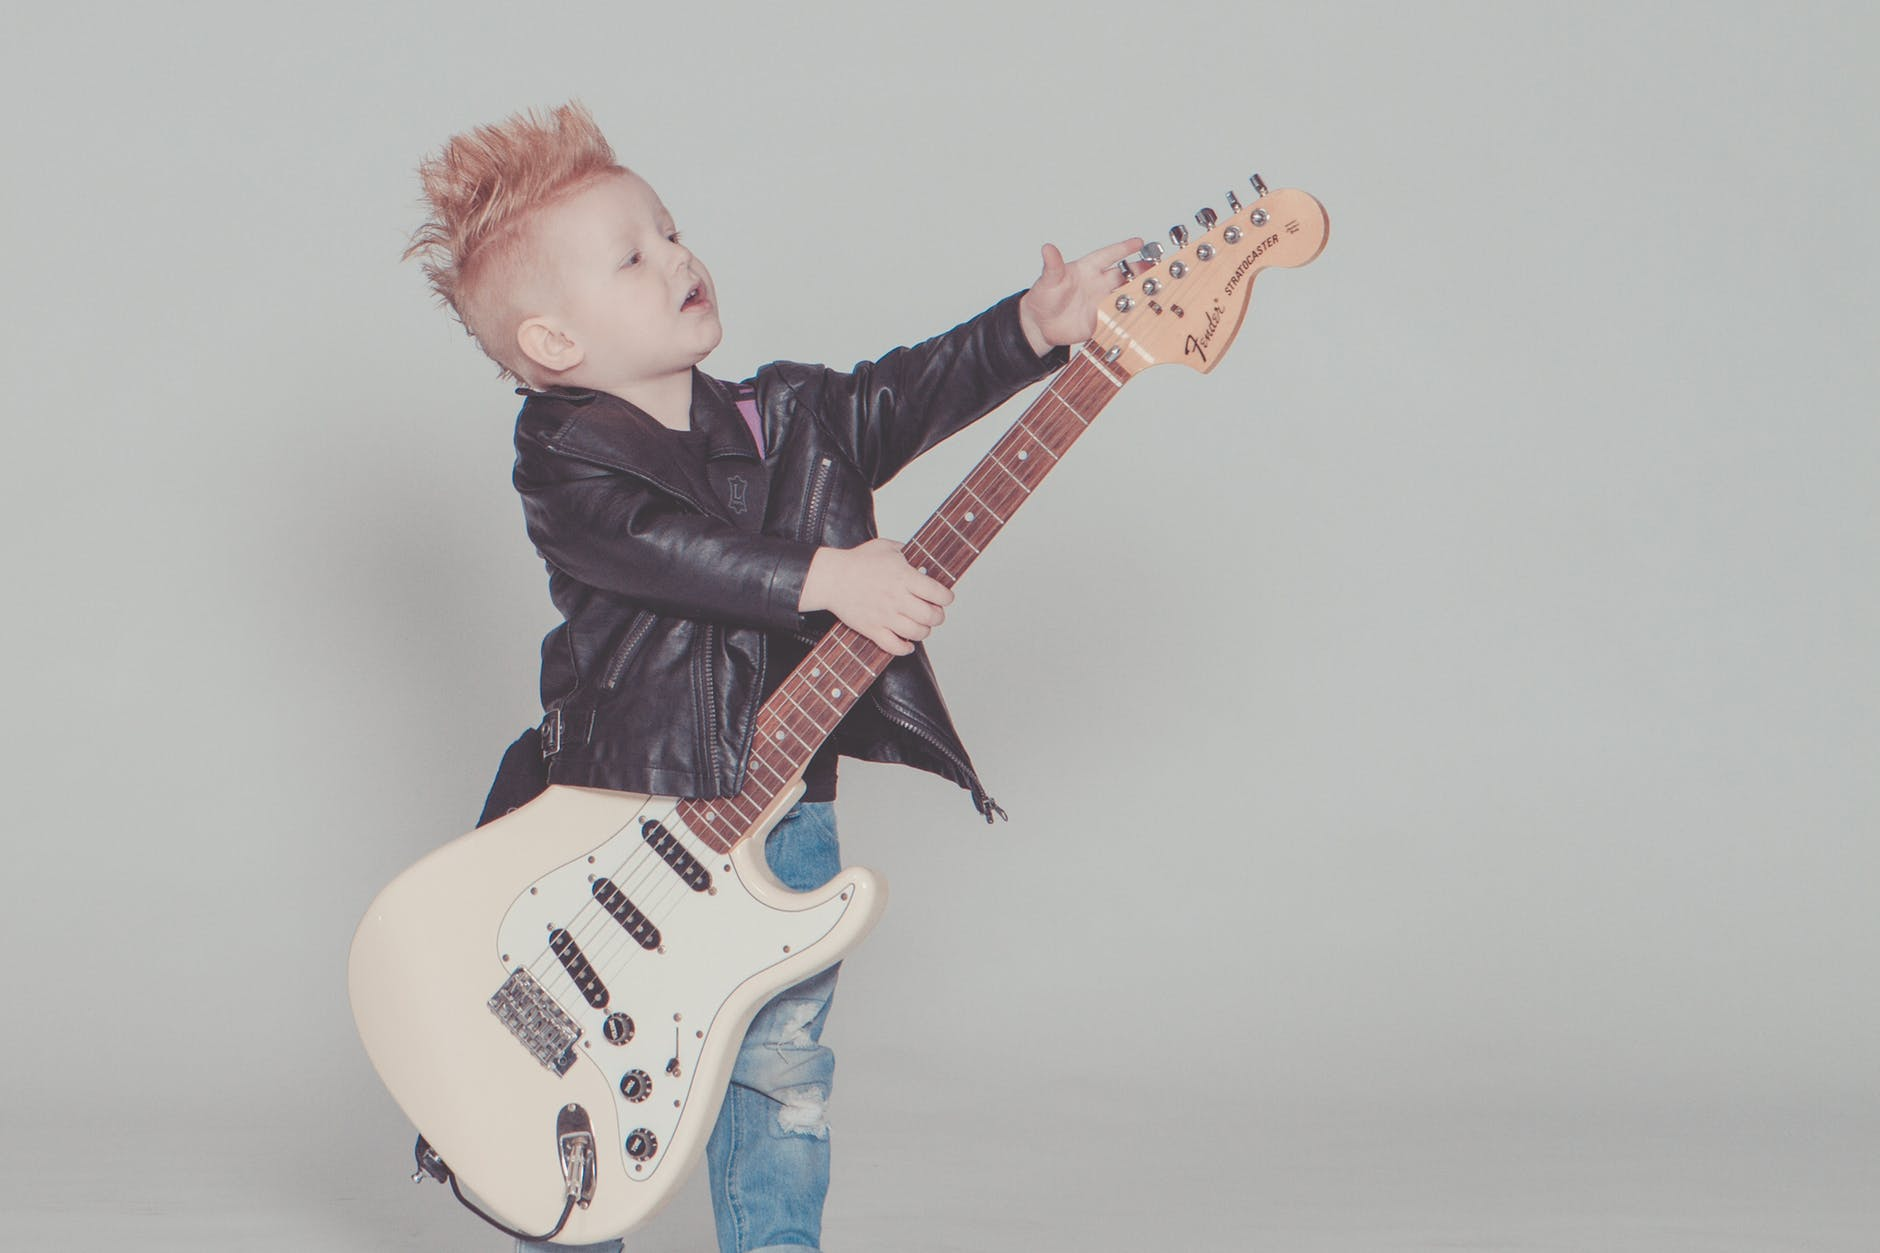 boy wearing black jacket holding electric guitar